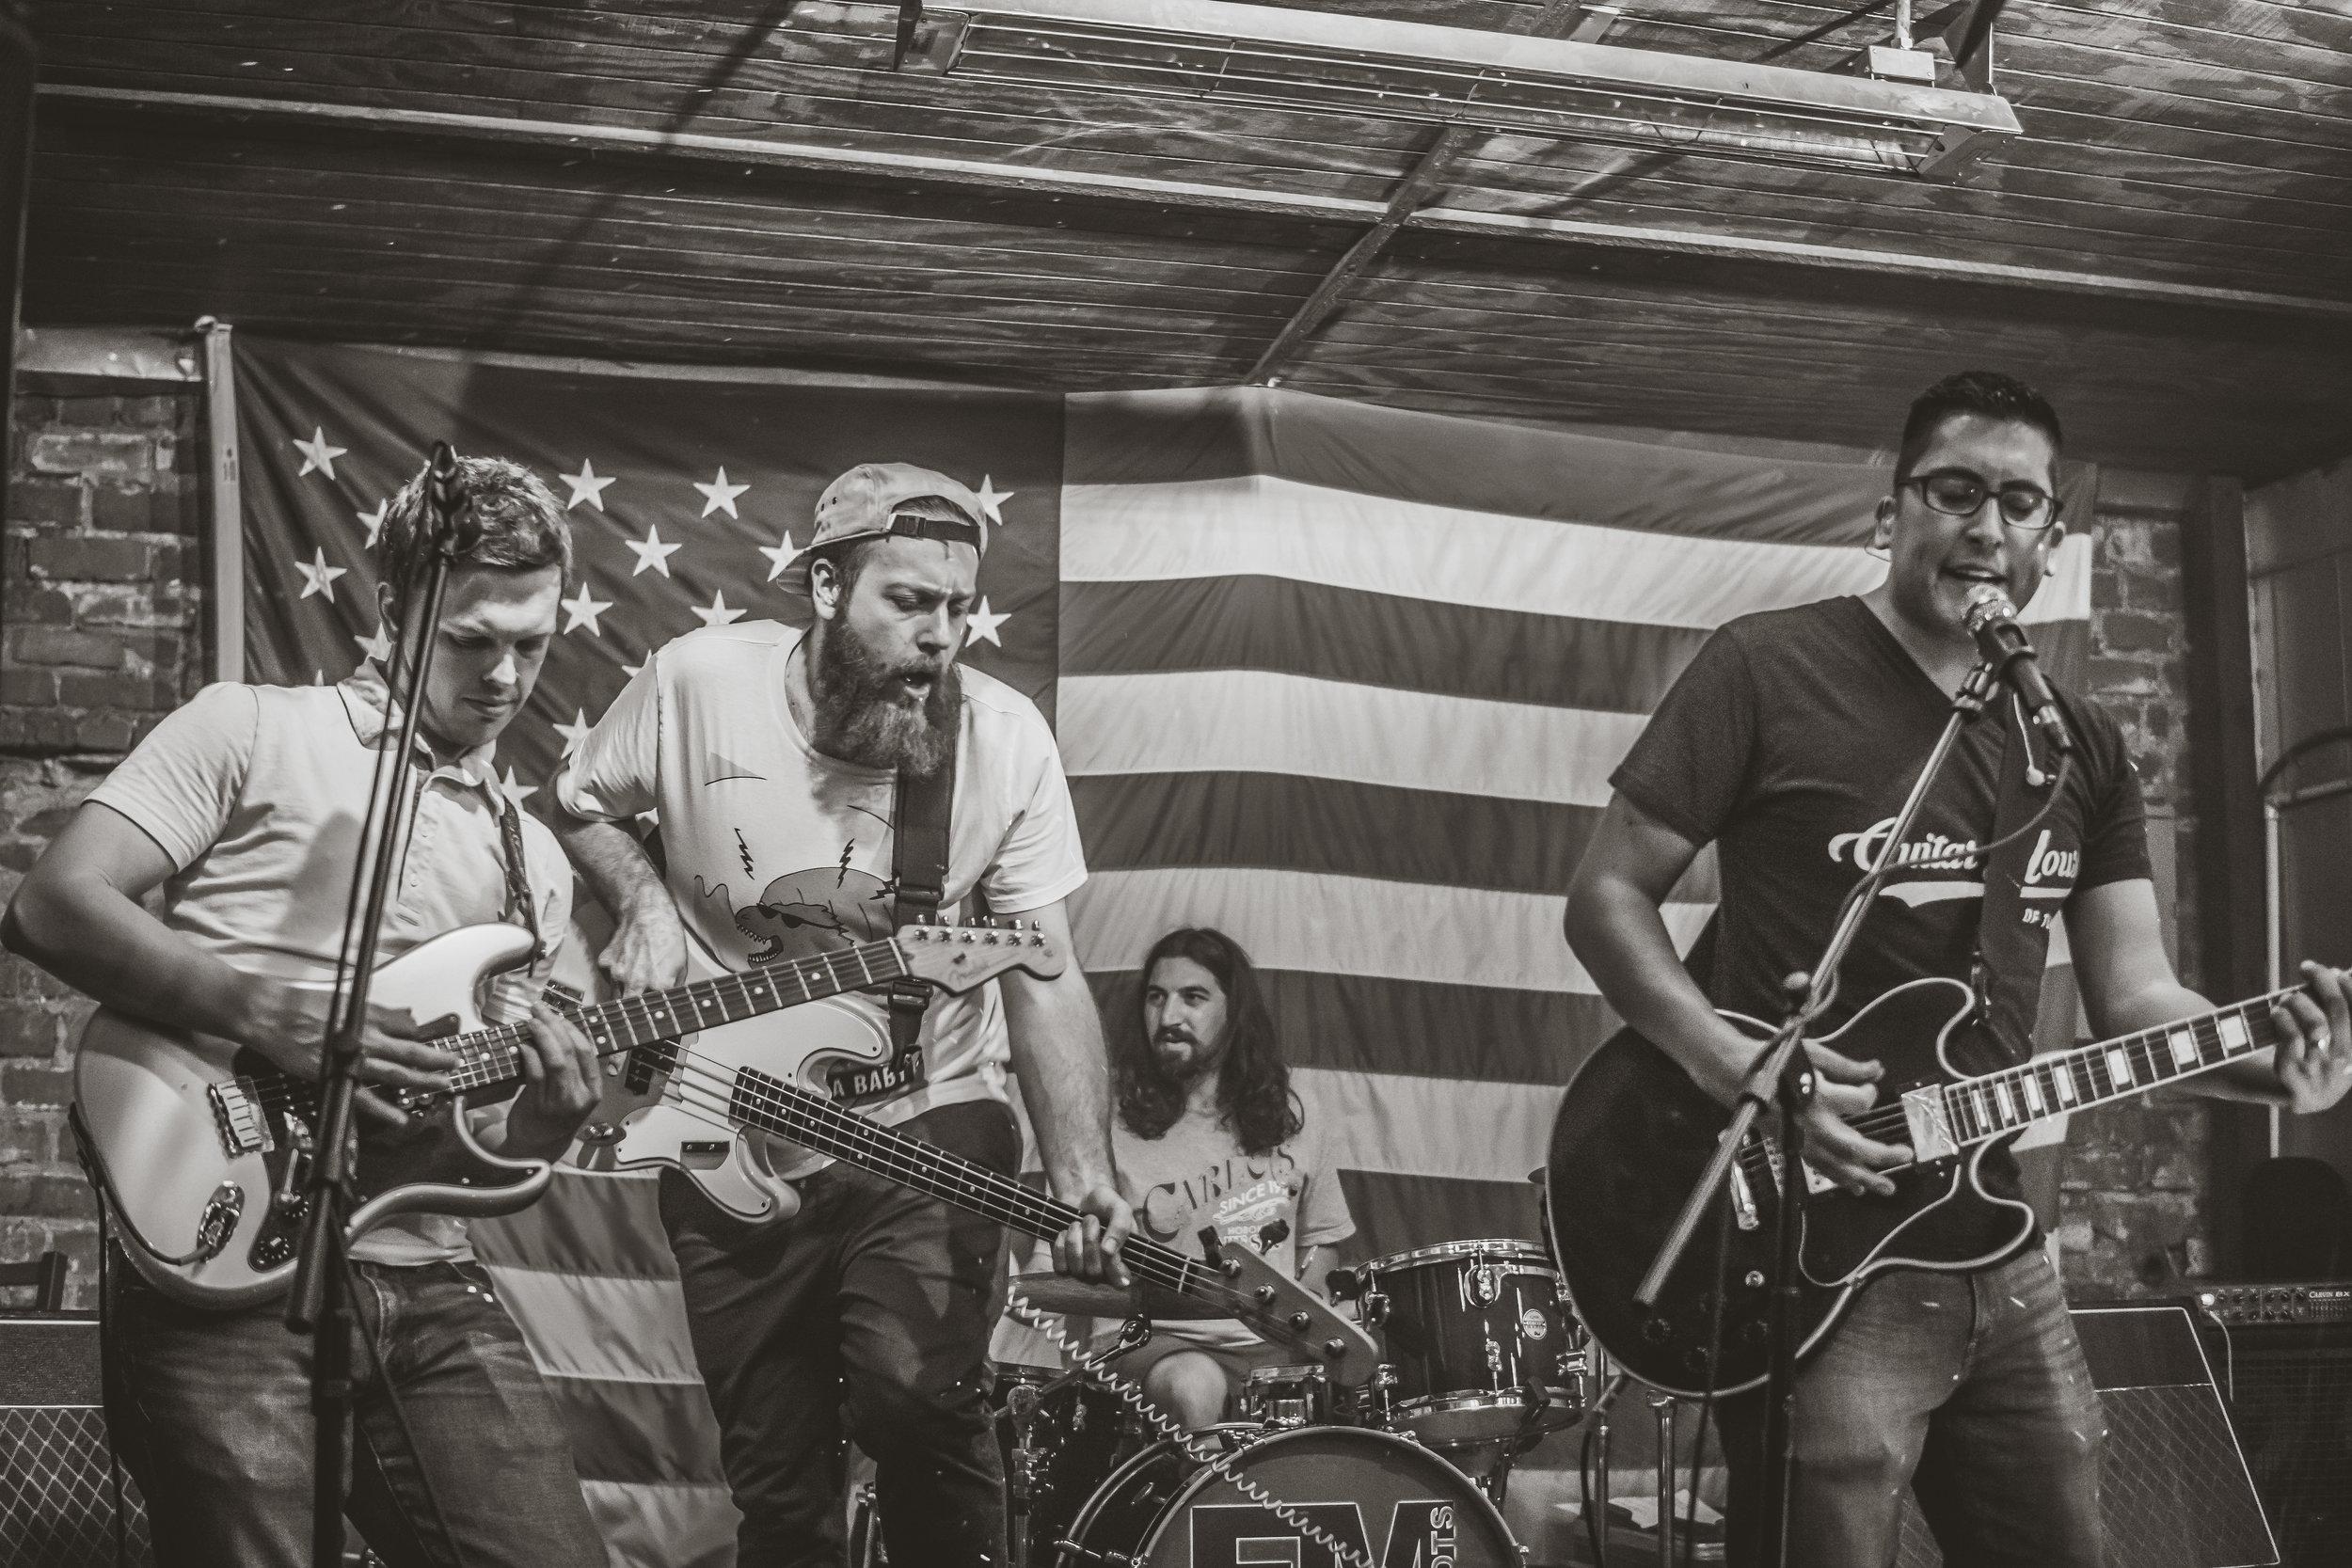 FM Pilots - Tulsa Rock Band - The Hunt Club Tulsa, OK 061016-2.jpg